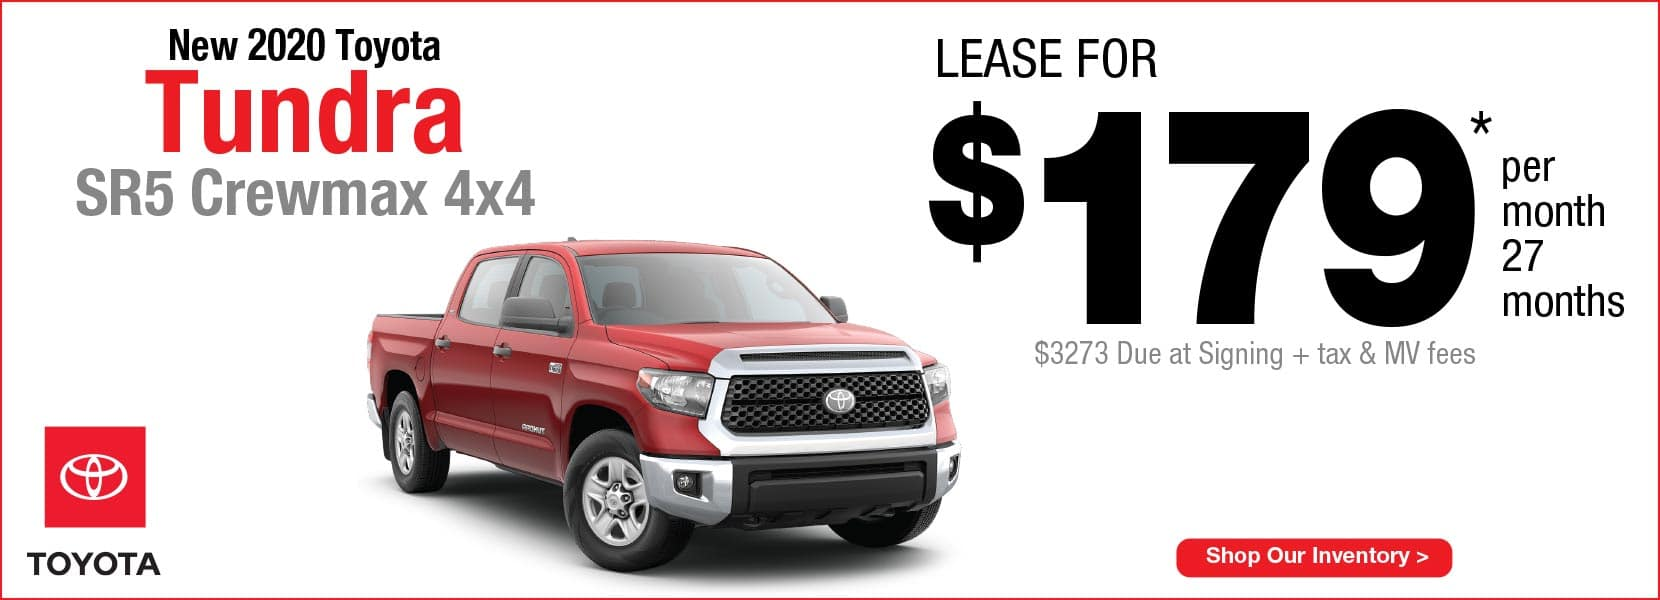 New 2020 Toyota Tundra  Koch 33 Toyota Lease offer Easton PA